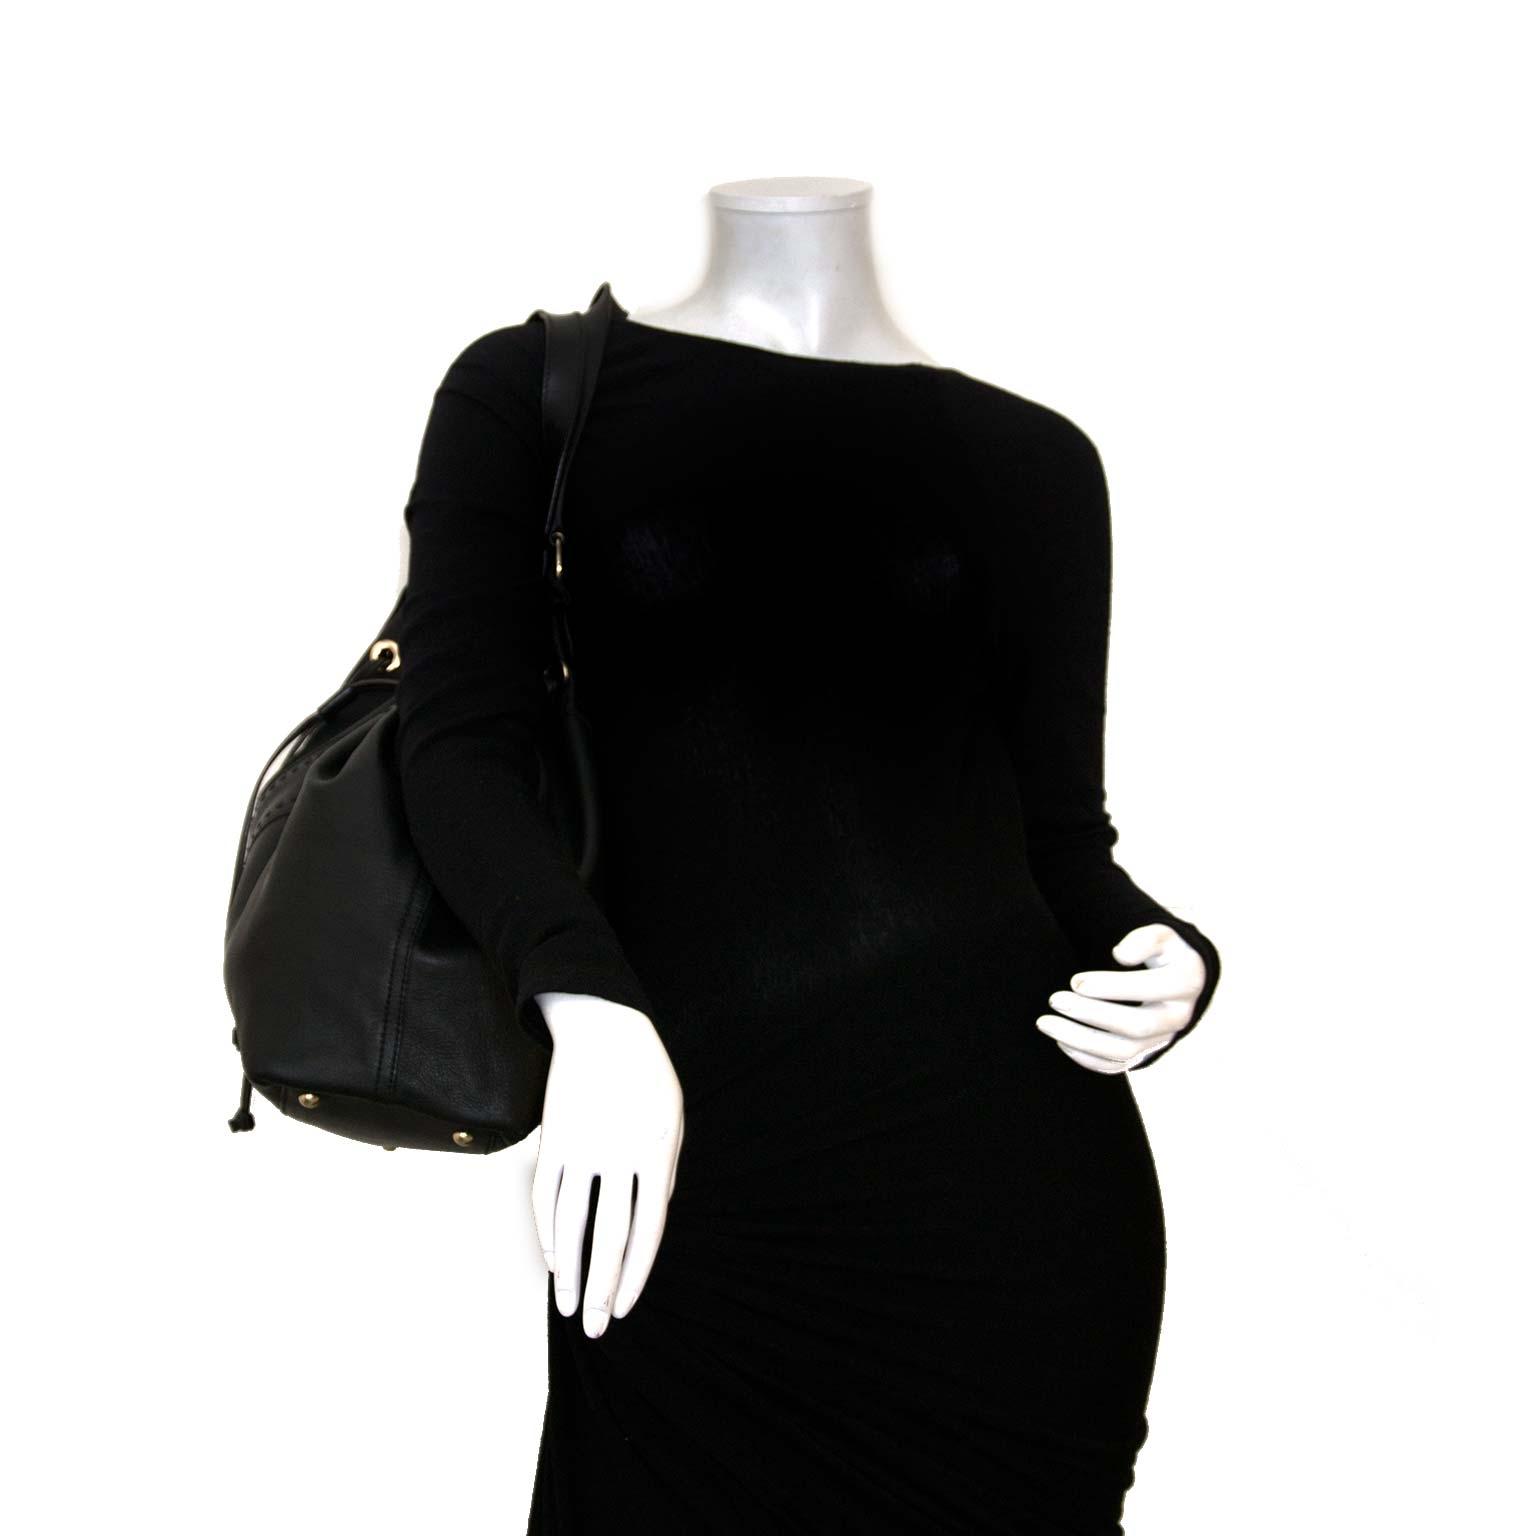 Koop authentieke Yves Saint Laurent Y tas nu online bij Labellov vintage webshop